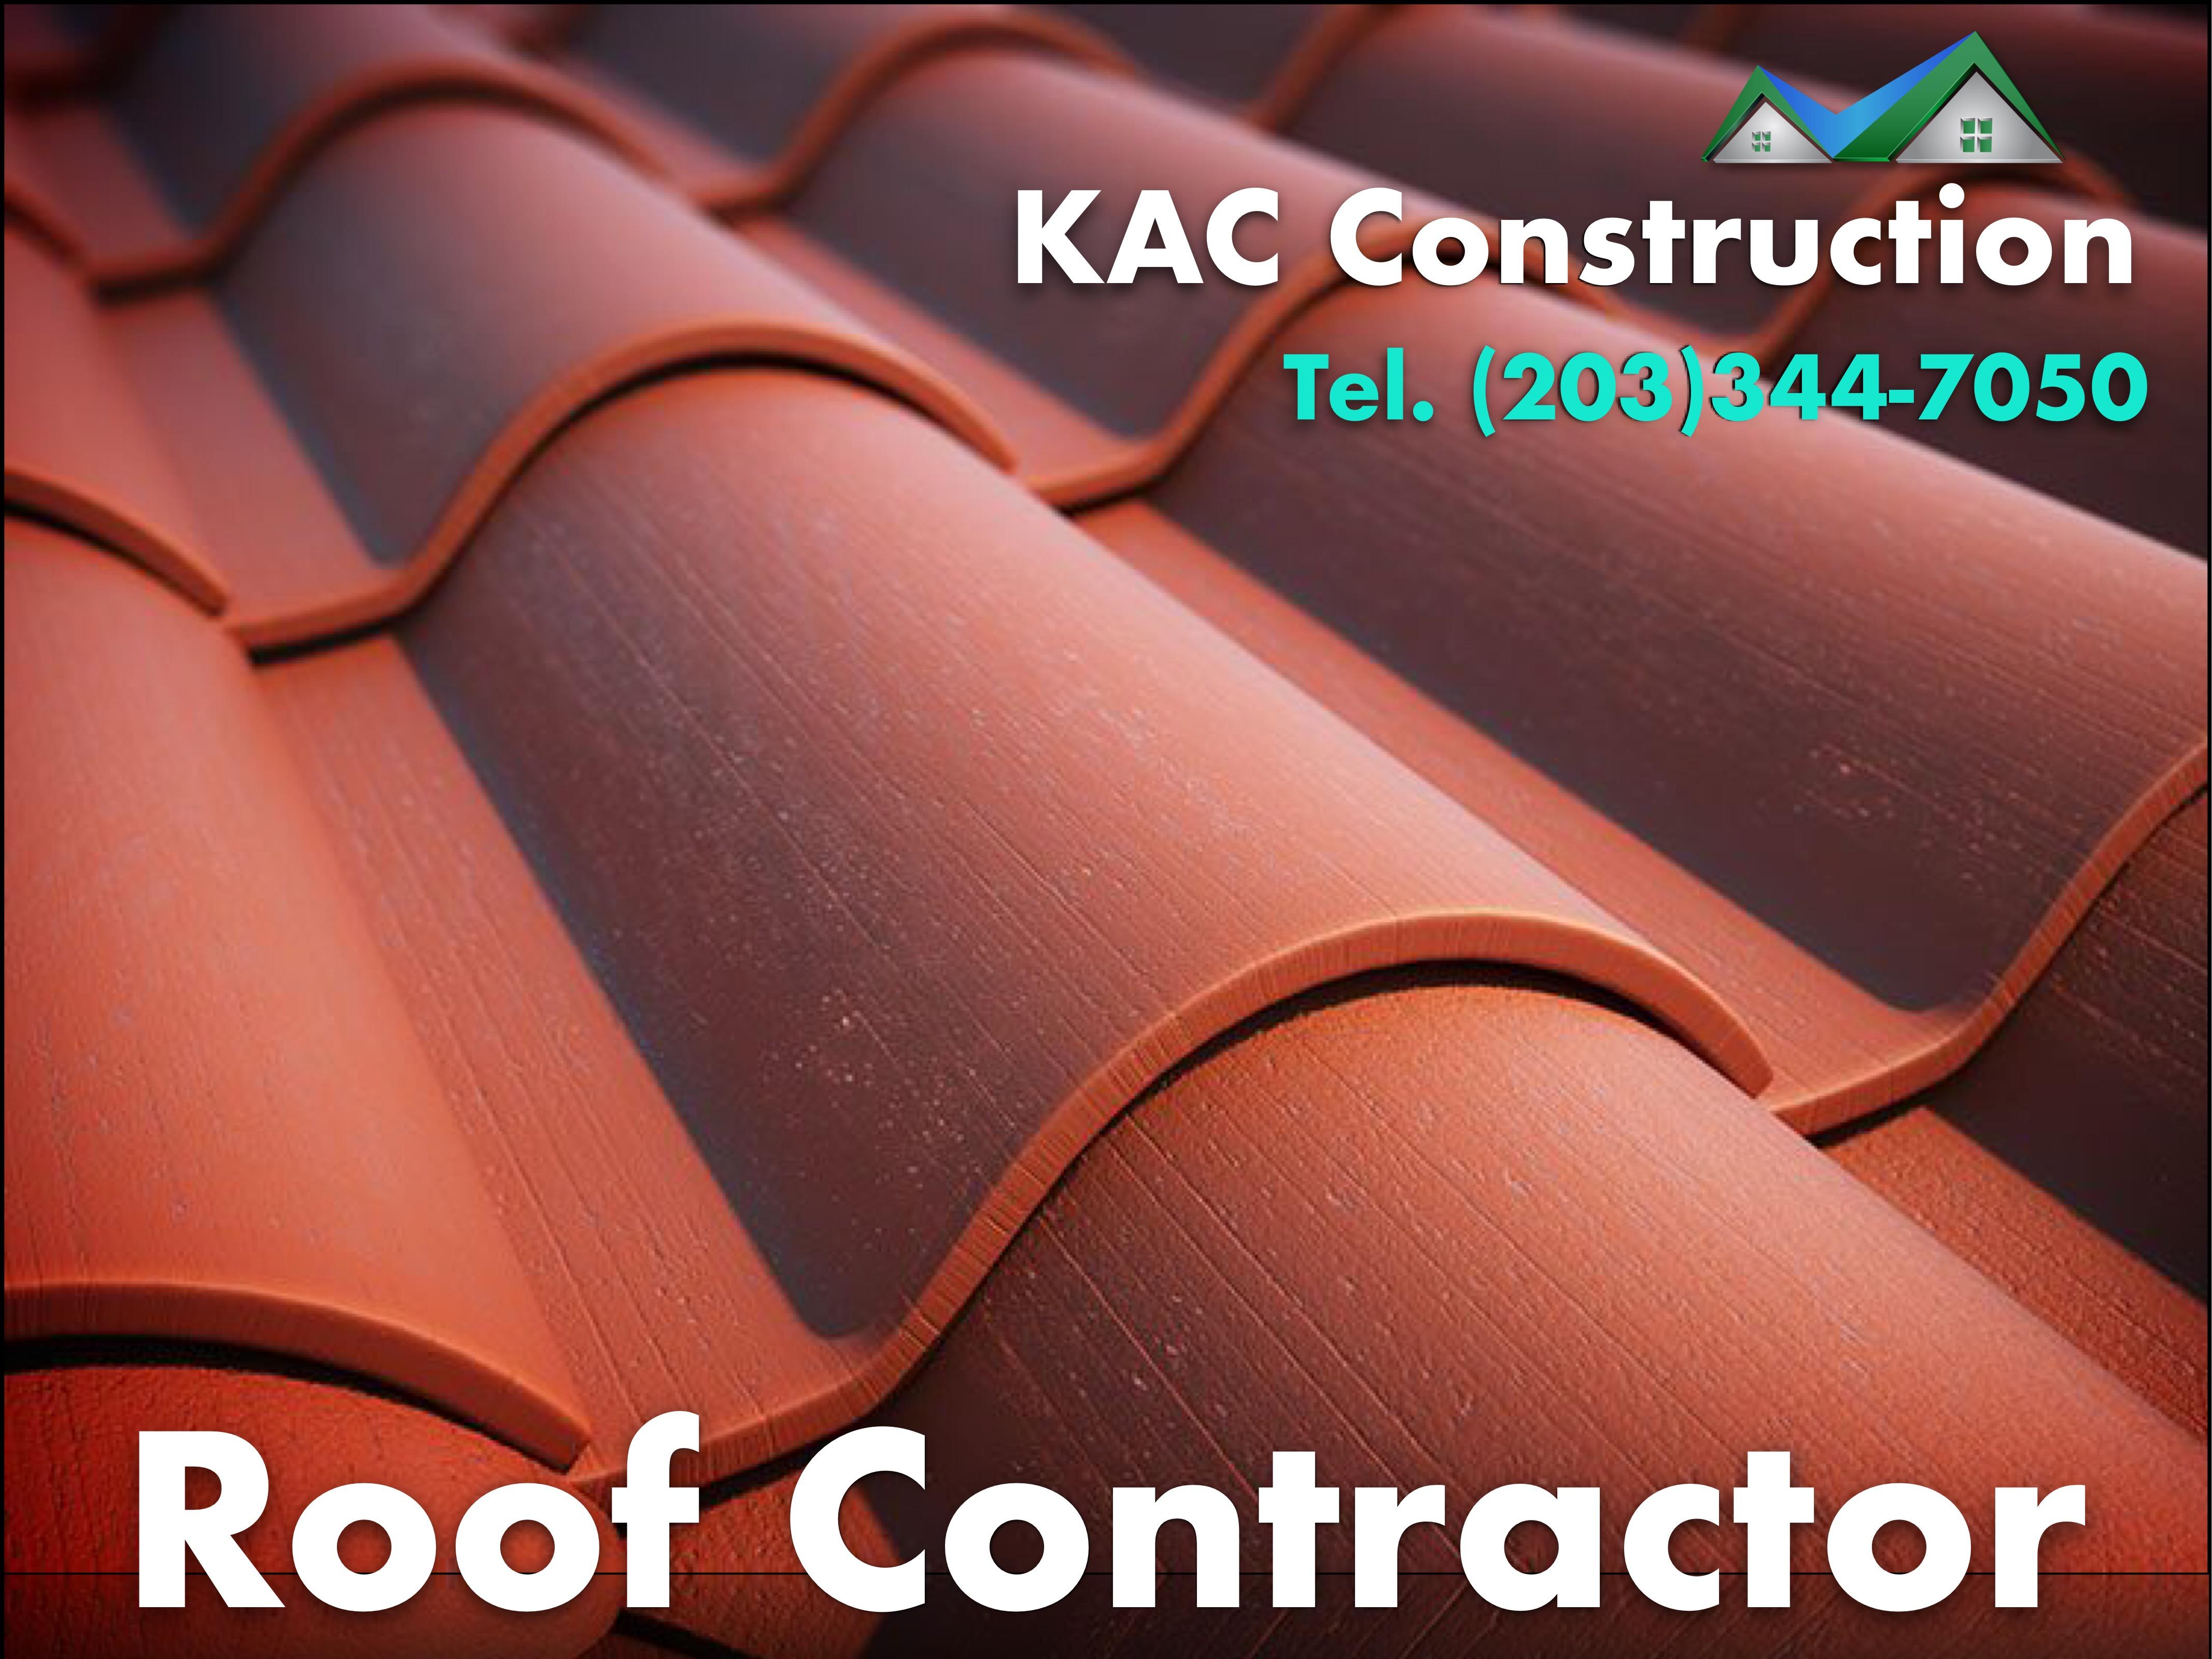 Best roof cranston, best roof cranston ri, best roof in cranston, best roof in cranston ri, best roof replacement, best roof replacement cranston, best roof replacement cranston ri